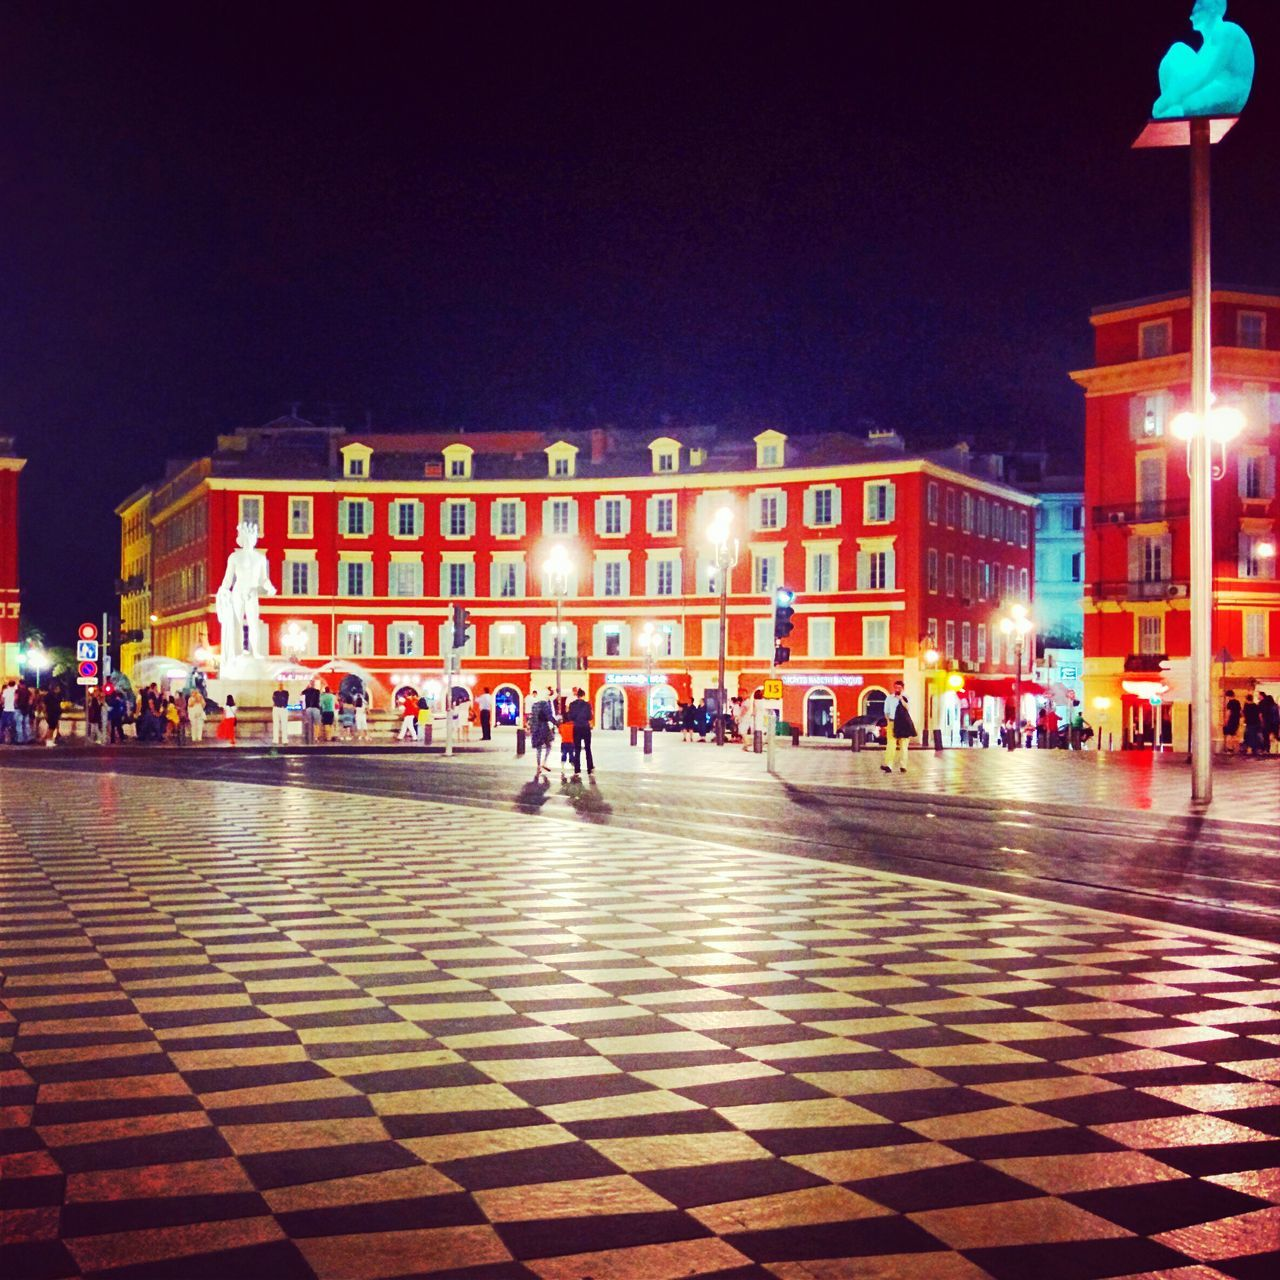 People Visiting At Illuminated Place Massena